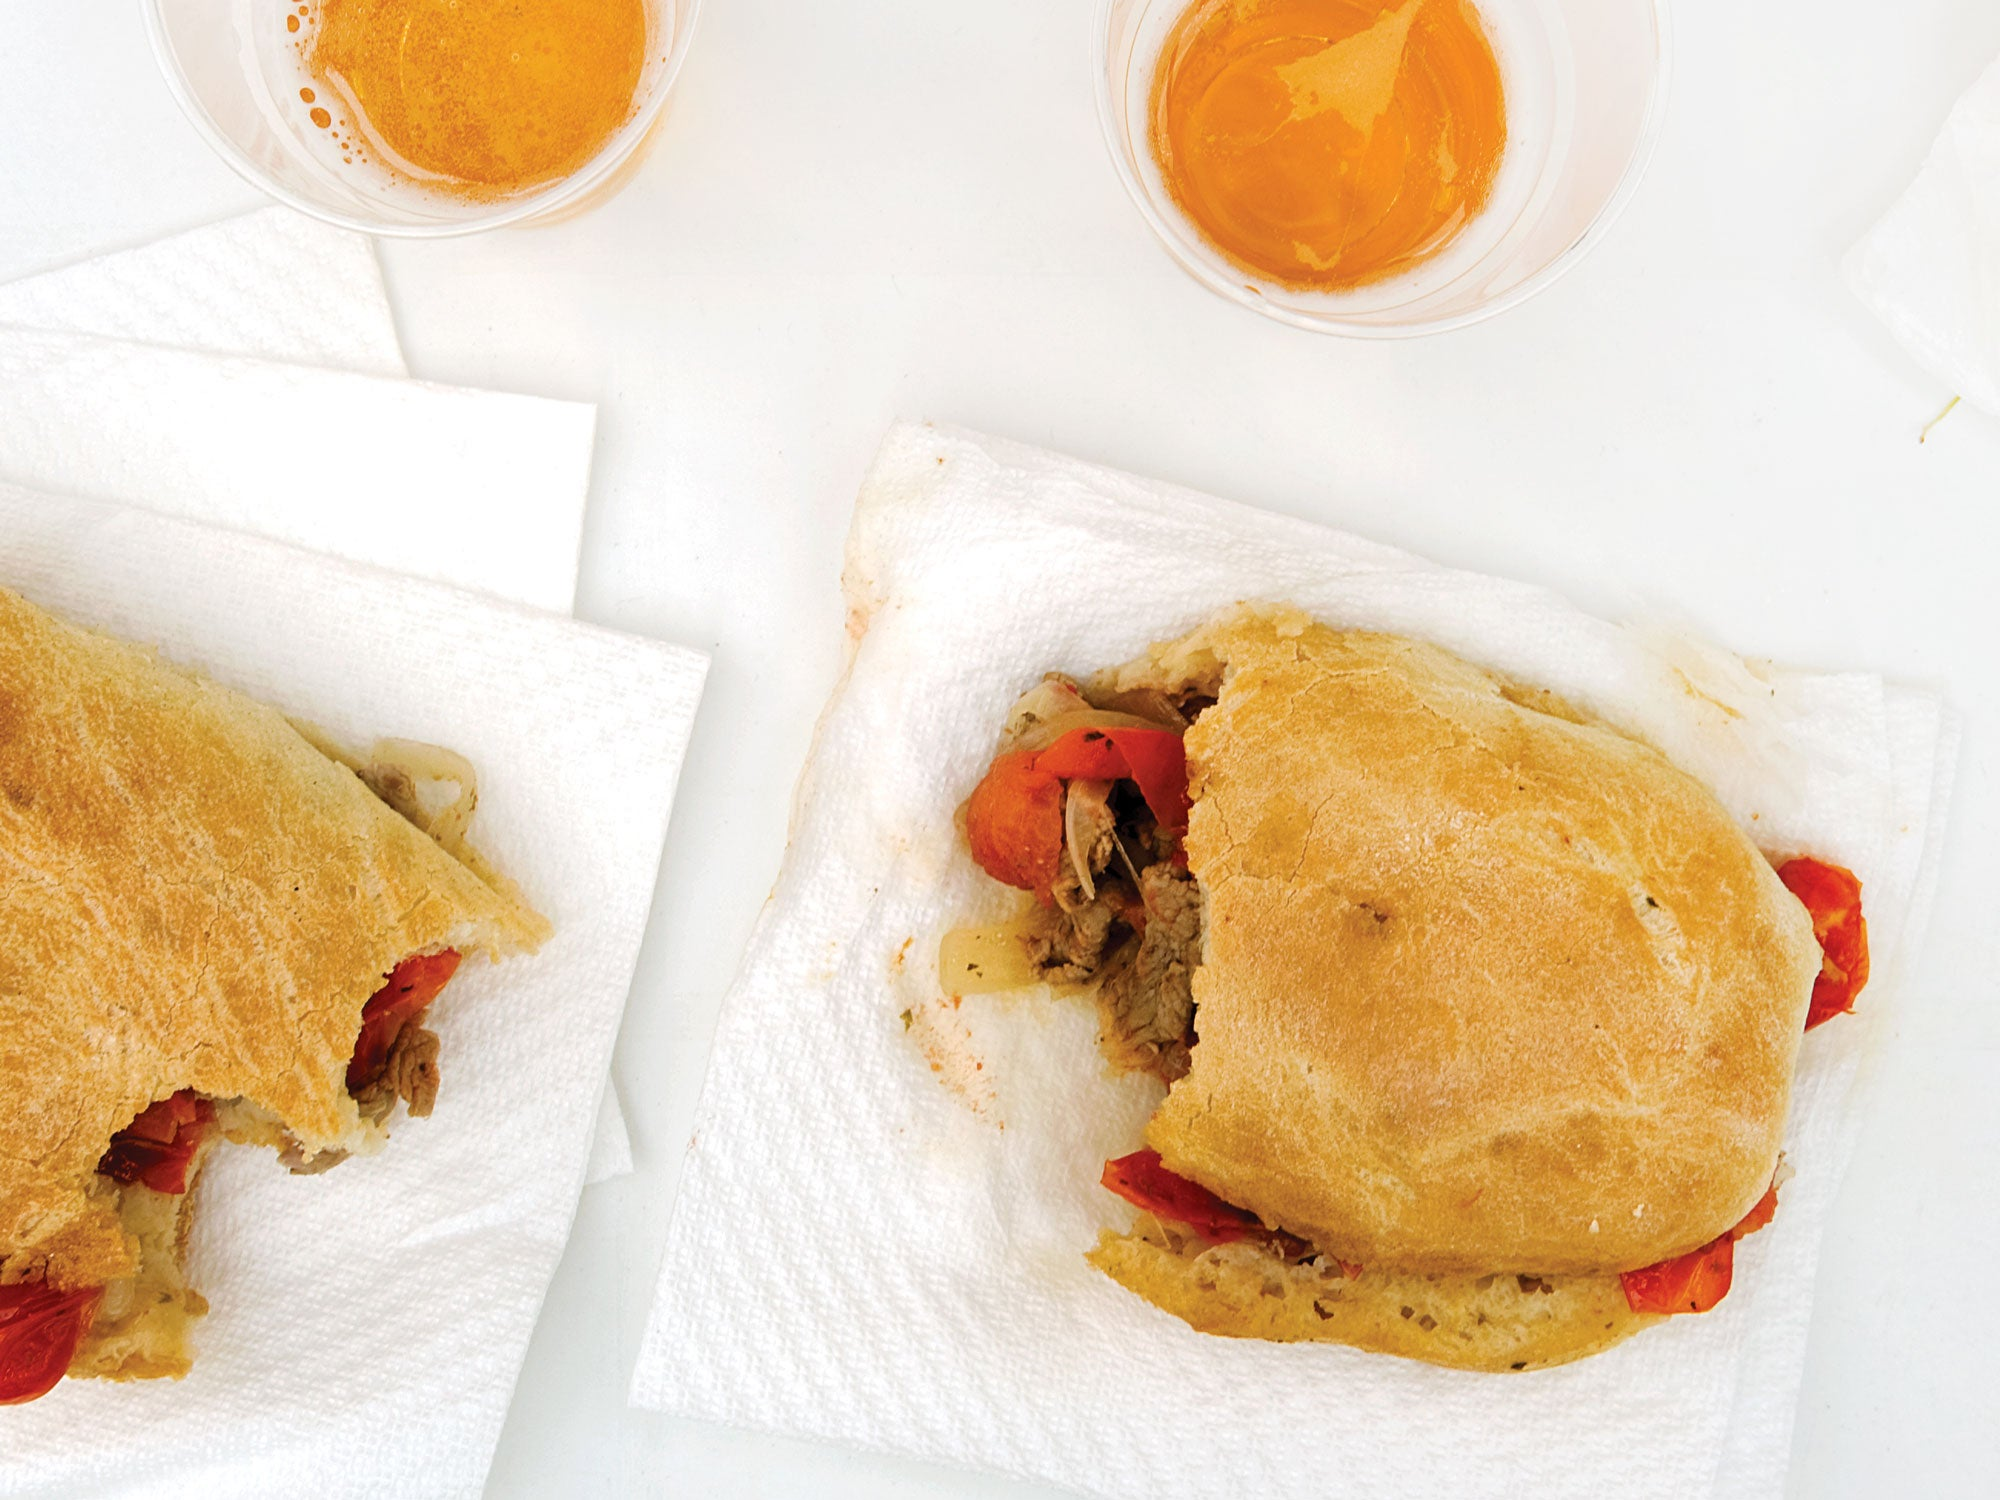 Calf's Liver, Caramelized Onion, and Tomato Sandwiches